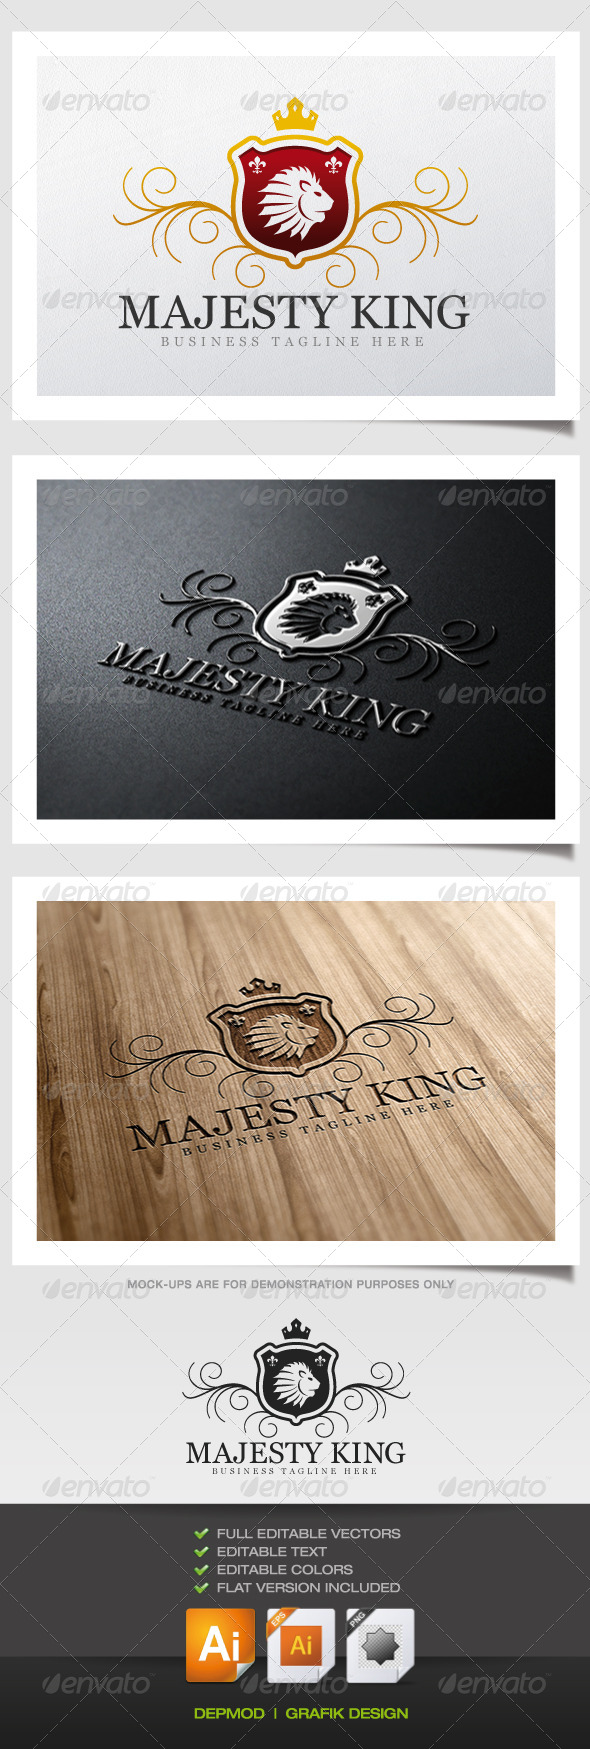 GraphicRiver Majesty King Logo 5687861